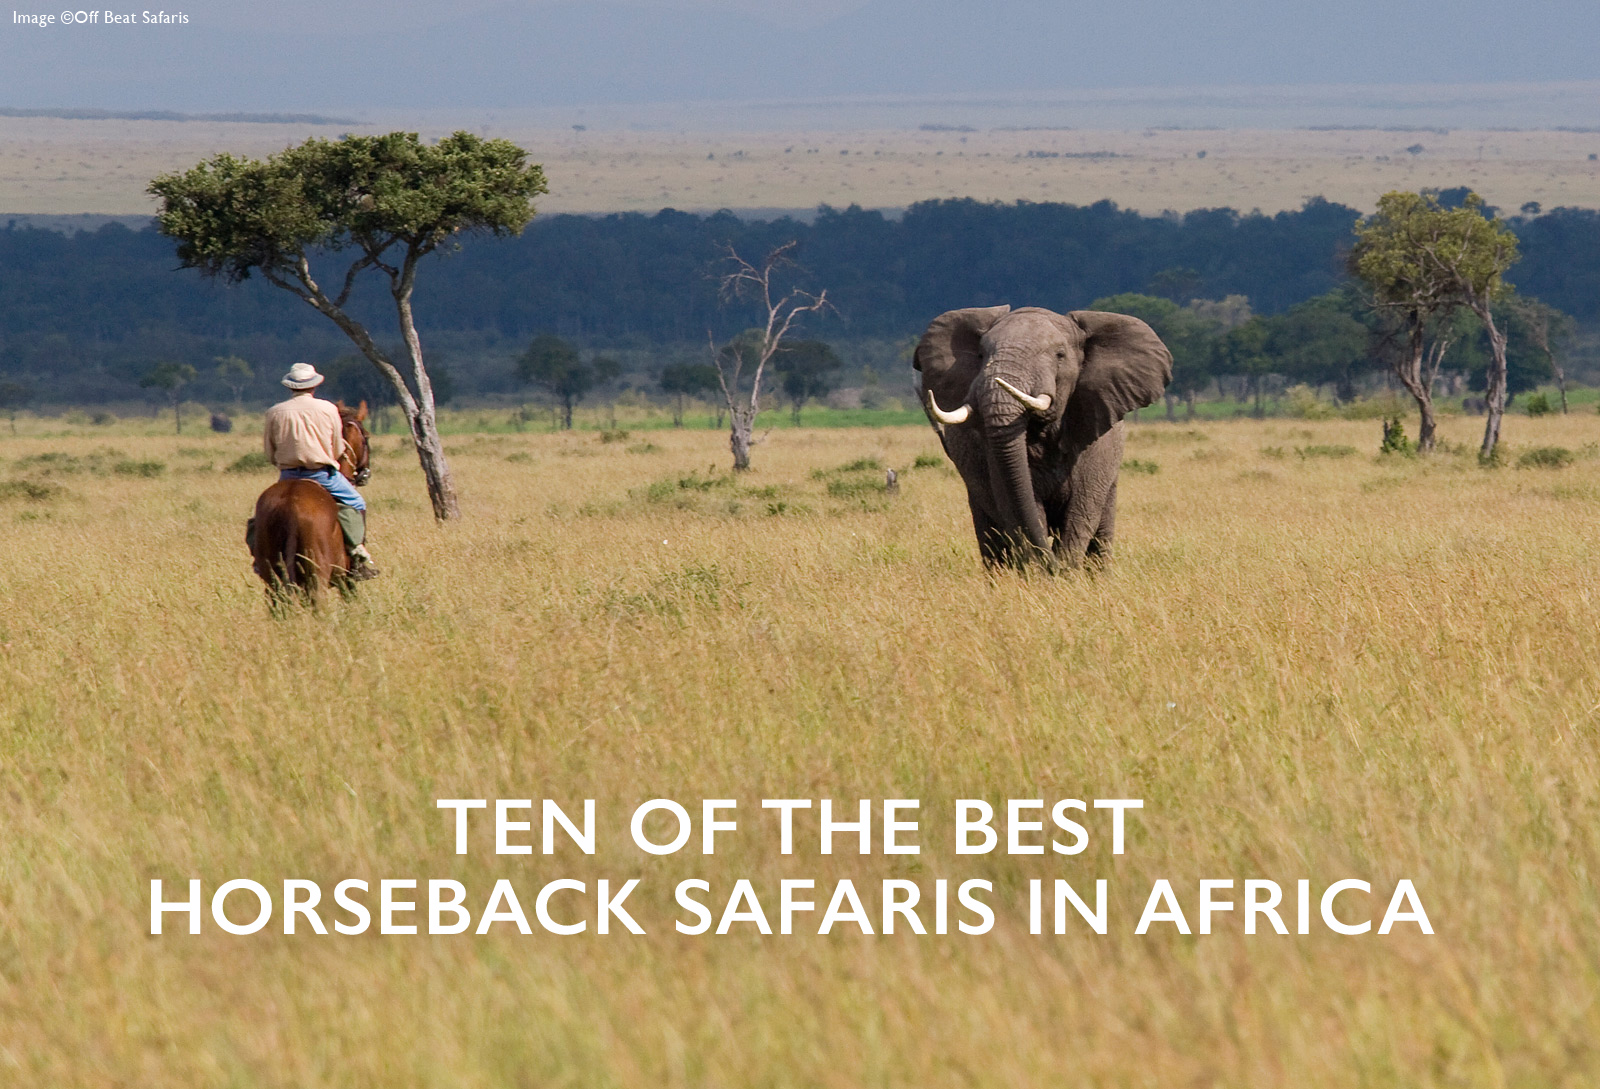 10 of the best horseback safaris in Africa   Africa Geographic Magazine. 10 of the best horseback safaris in Africa   Africa Geographic